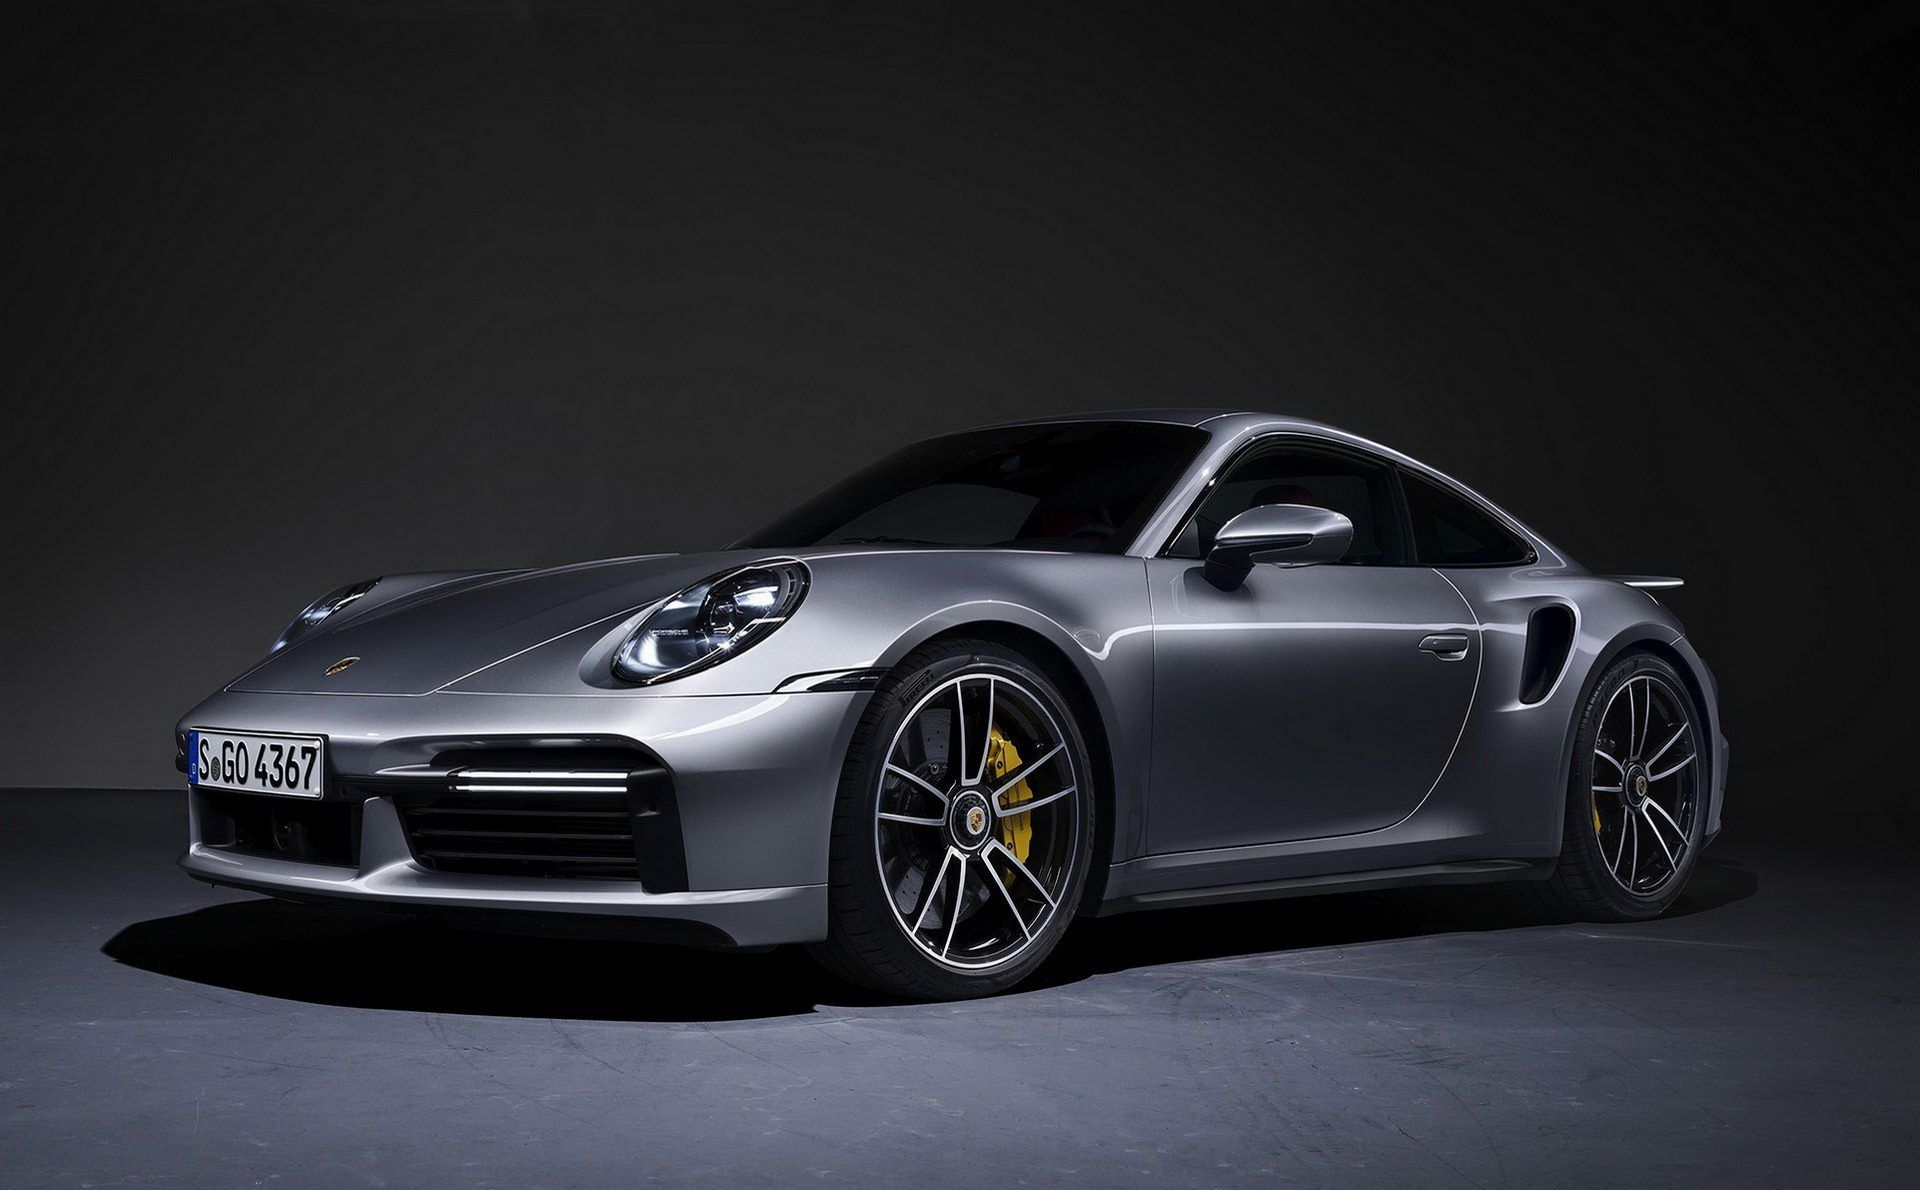 Porsche-911-Turbo-S-2020-20